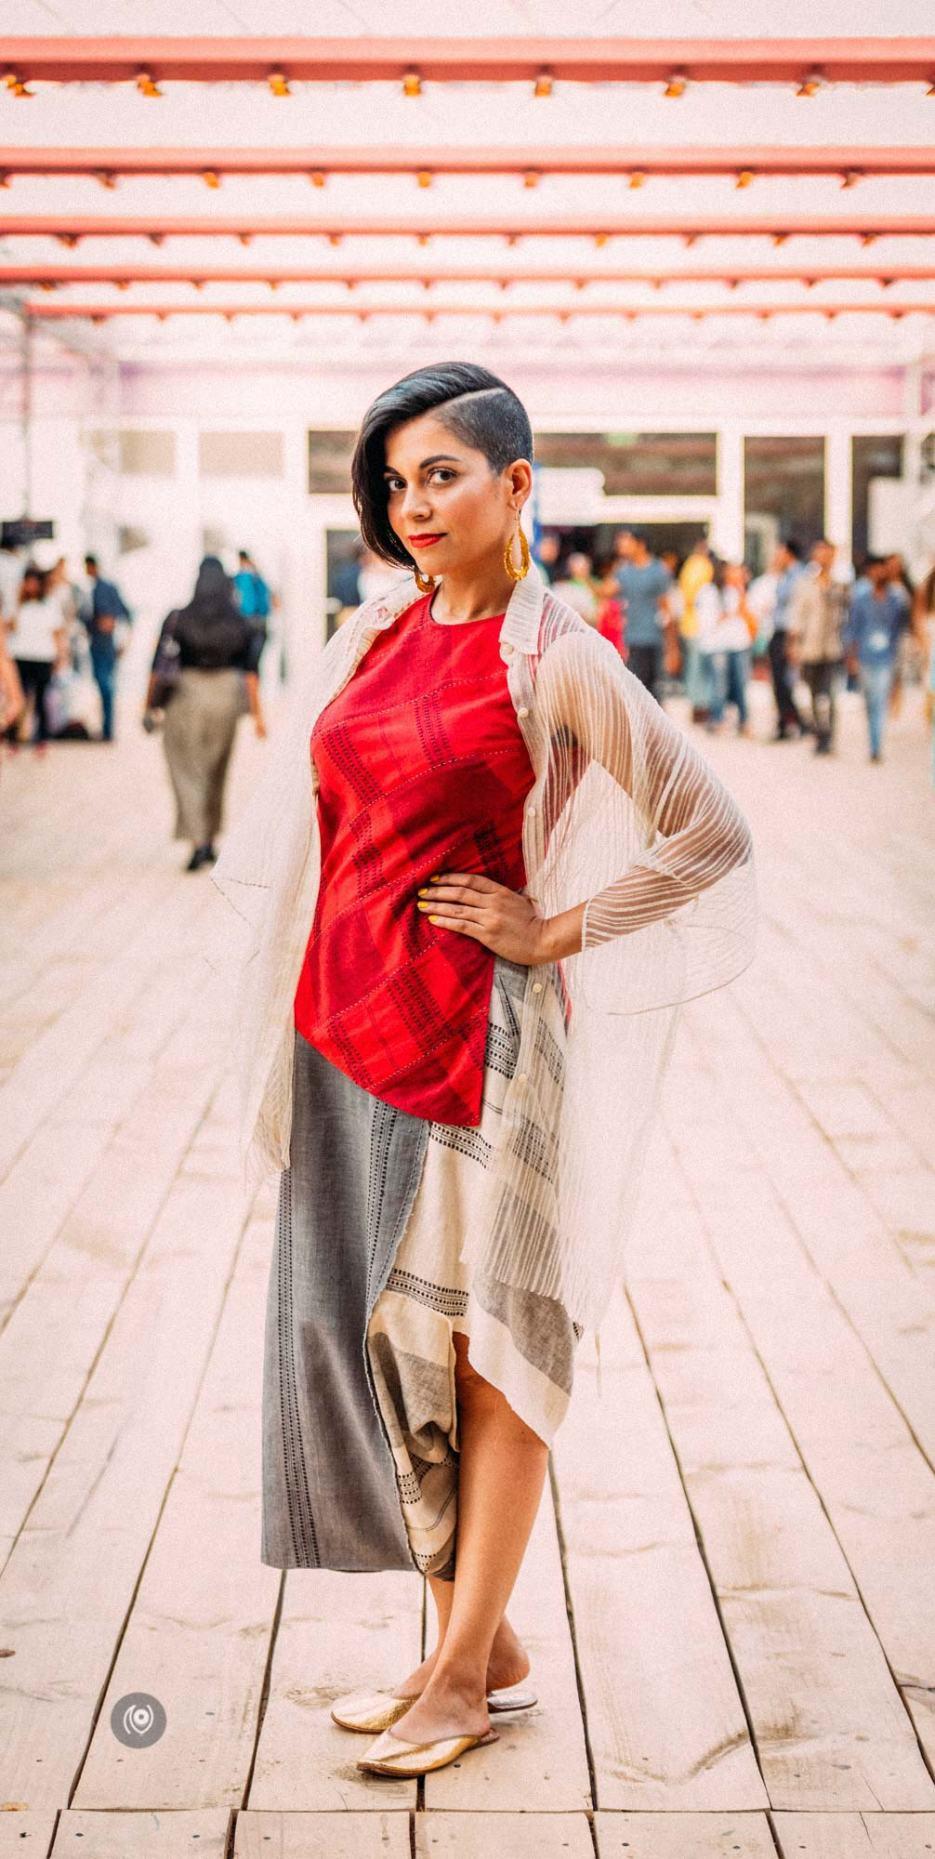 Naina.co, Visual Storyteller, Luxury Brands, Naina Redhu, Professional Photographer, Experience Collector, Luxury Photographer, Luxury Blogger, Lifestyle, Visual Storyteller for Luxury Brands, EyesForLuxury, Luxury Blogger, Lifestyle Blogger, Luxury Photographer India, Lifestyle Photographer India, Luxury Blogger India, Lifestyle Blogger India, #EyesForFashion, #AIFWSS17, Amazon India Fashion Week, Spring Summer, #CoverUp, CoverUp 88, Day Tqo, India Fashion Week, Amazon Fashion Week, Kiko Milano, Makeup, Kiko Milano India, #EyesForBeauty, Urvashi Kaur